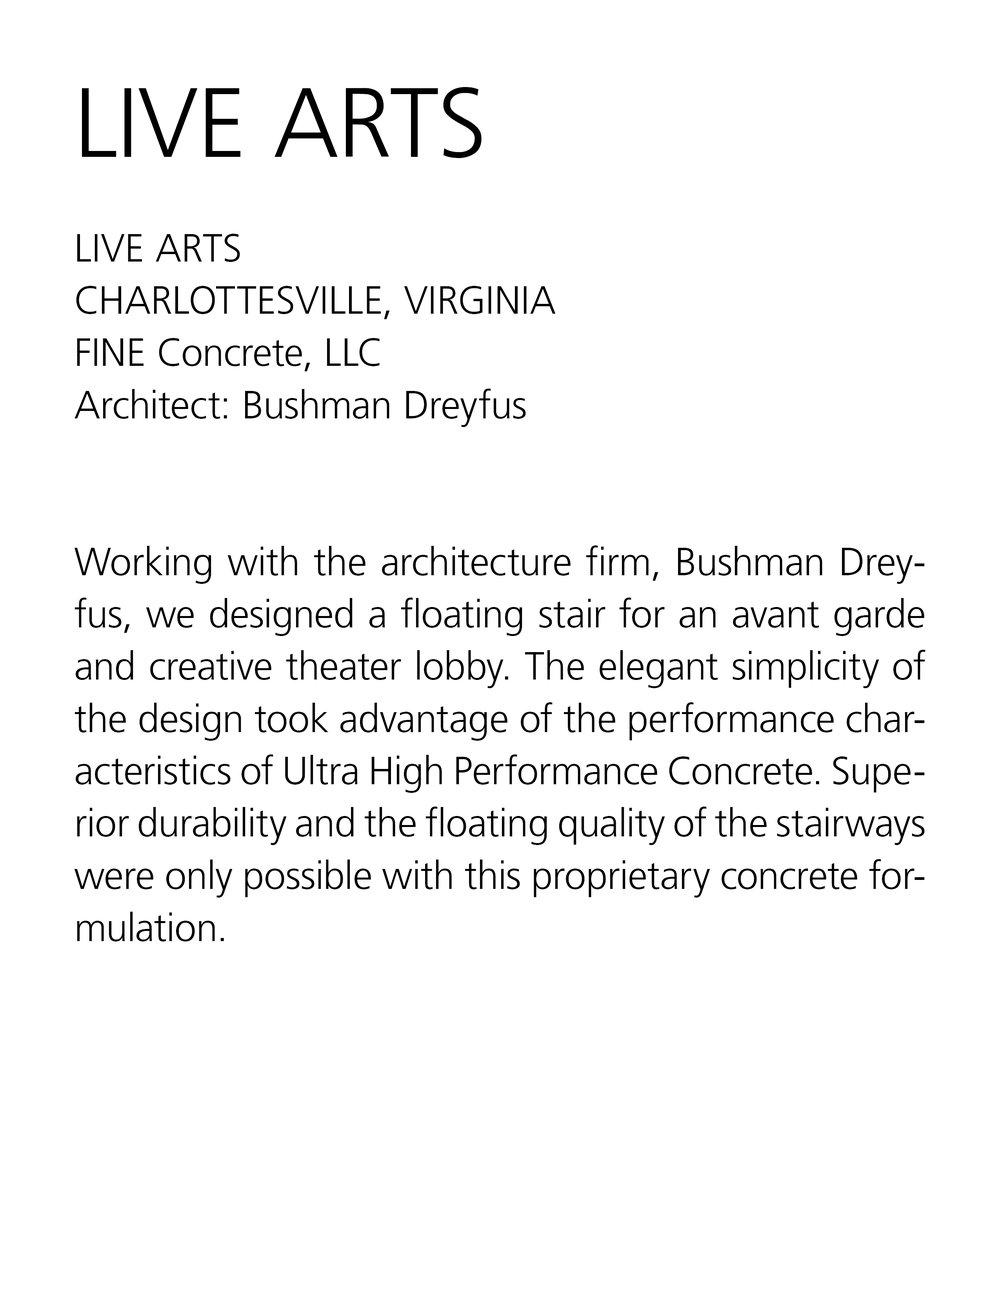 live arts description.jpg